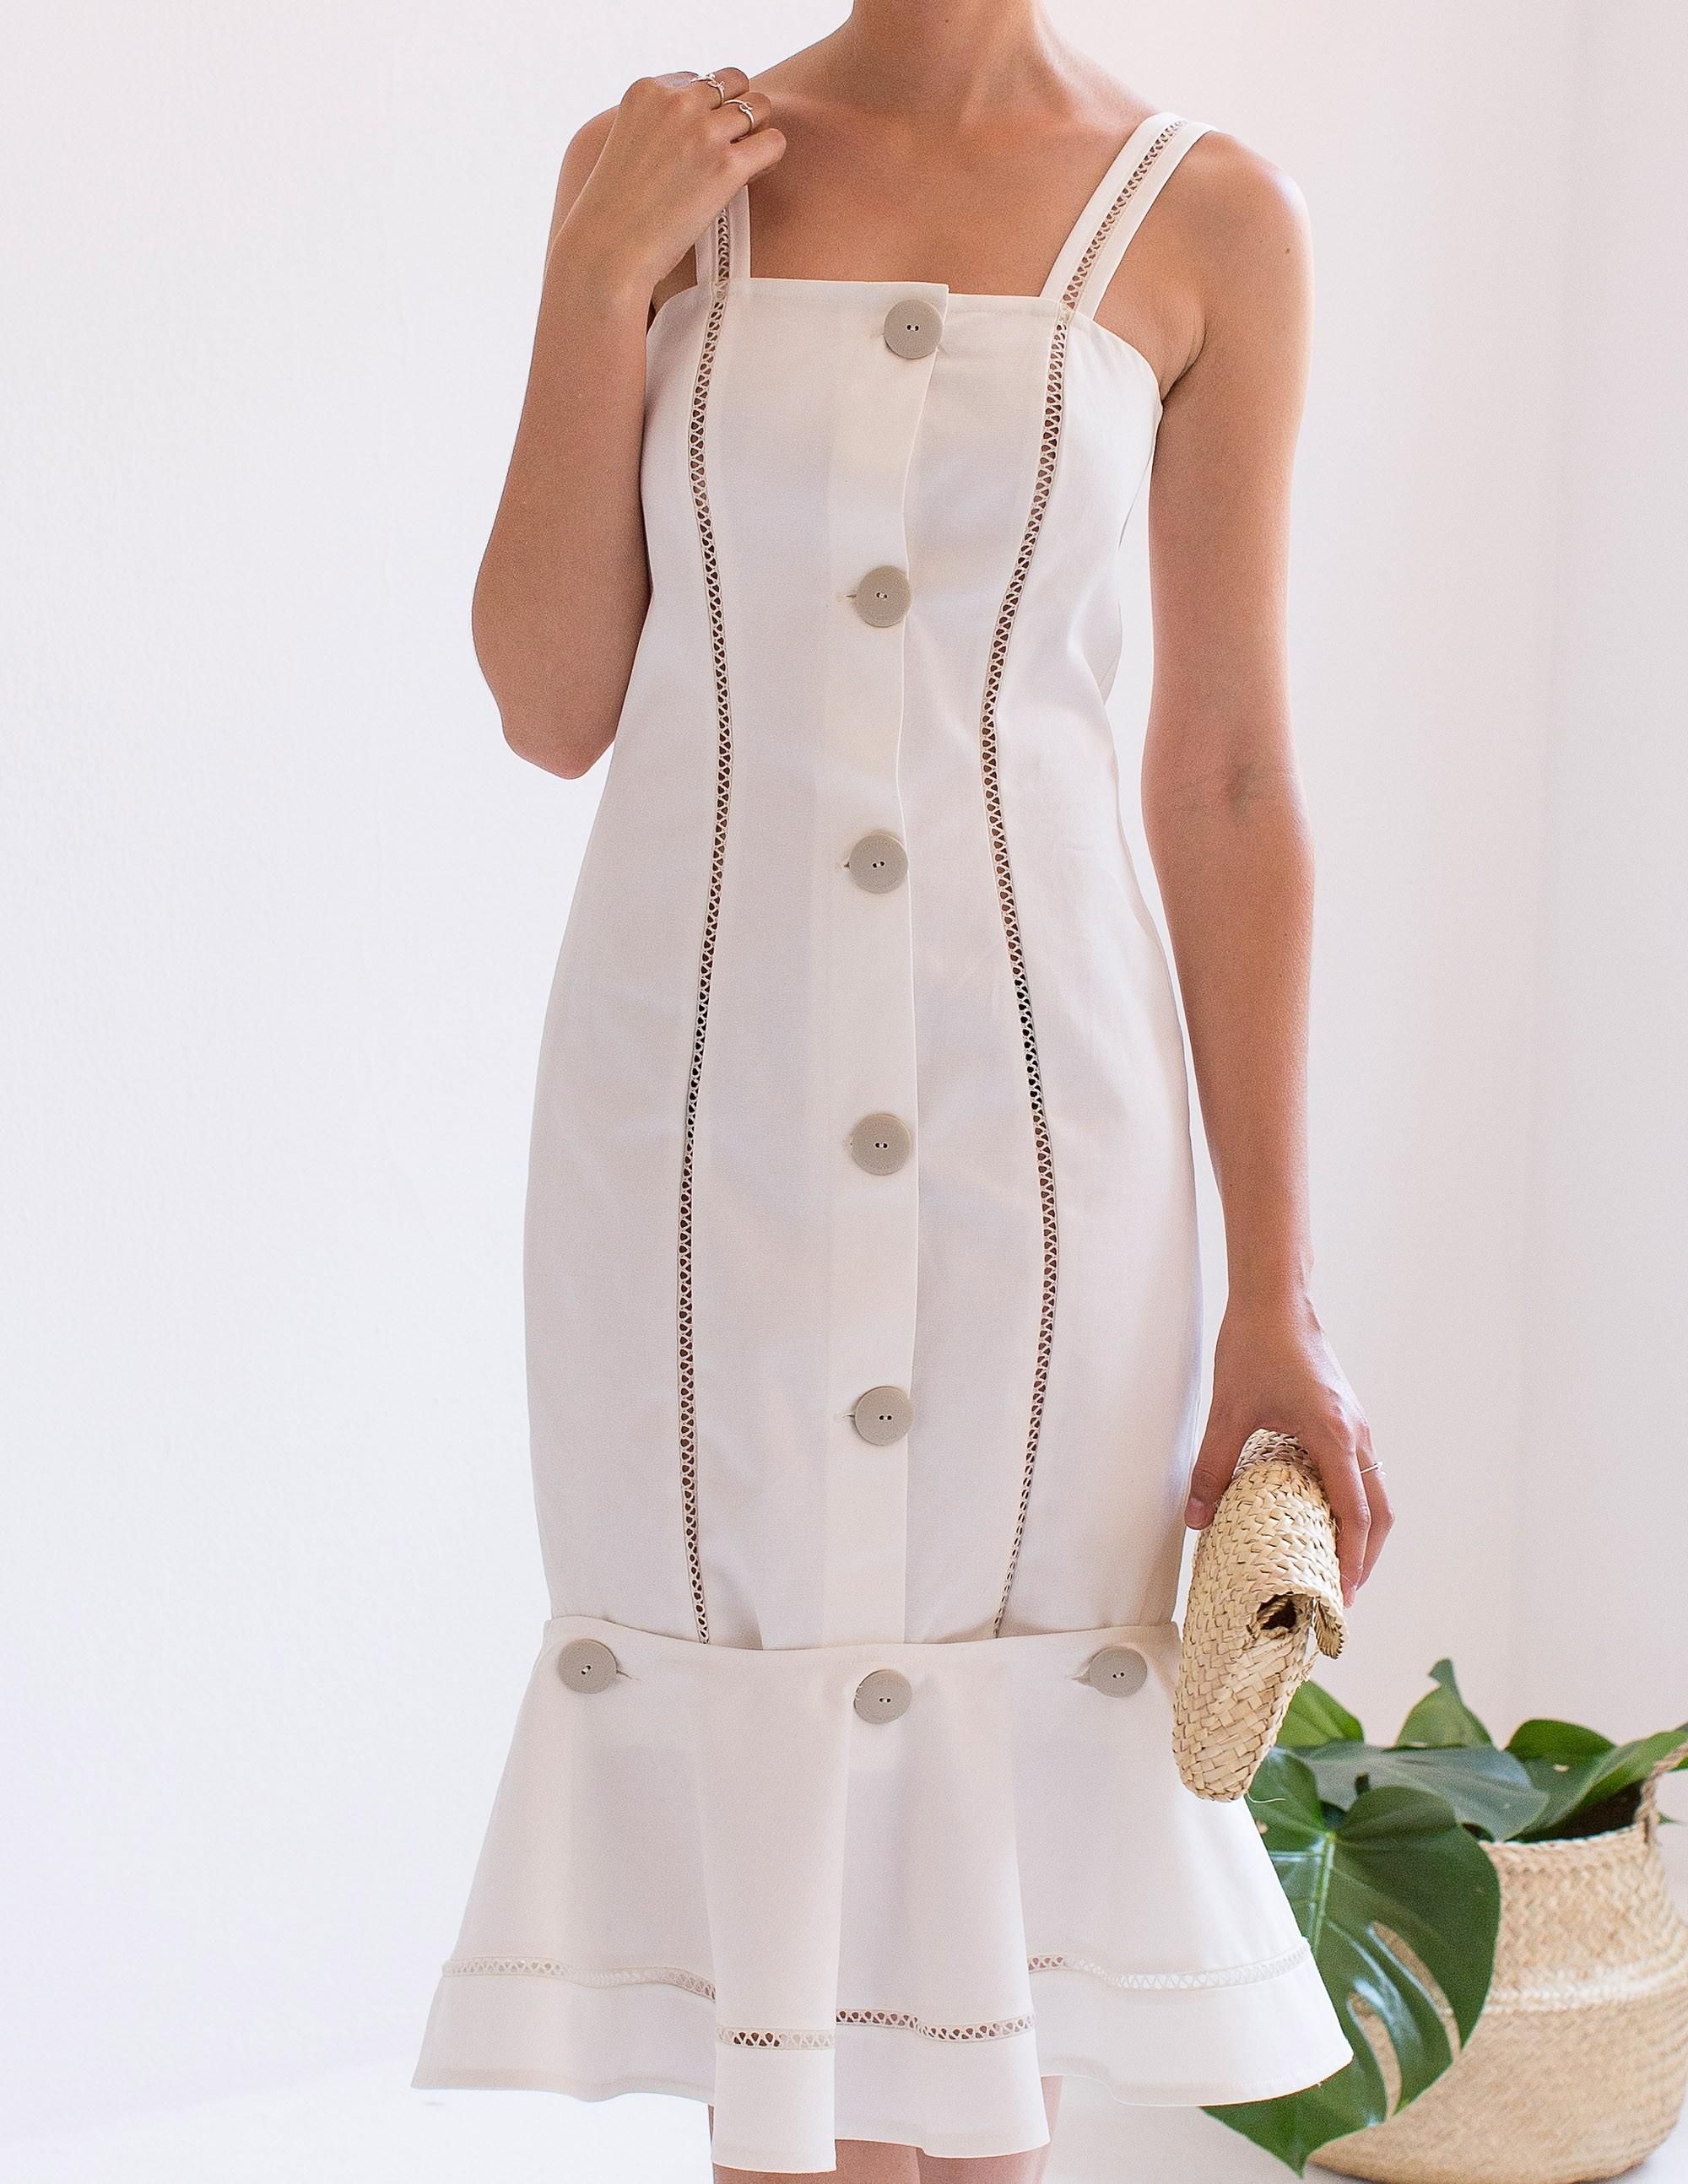 RAVELLO Dress - PURE